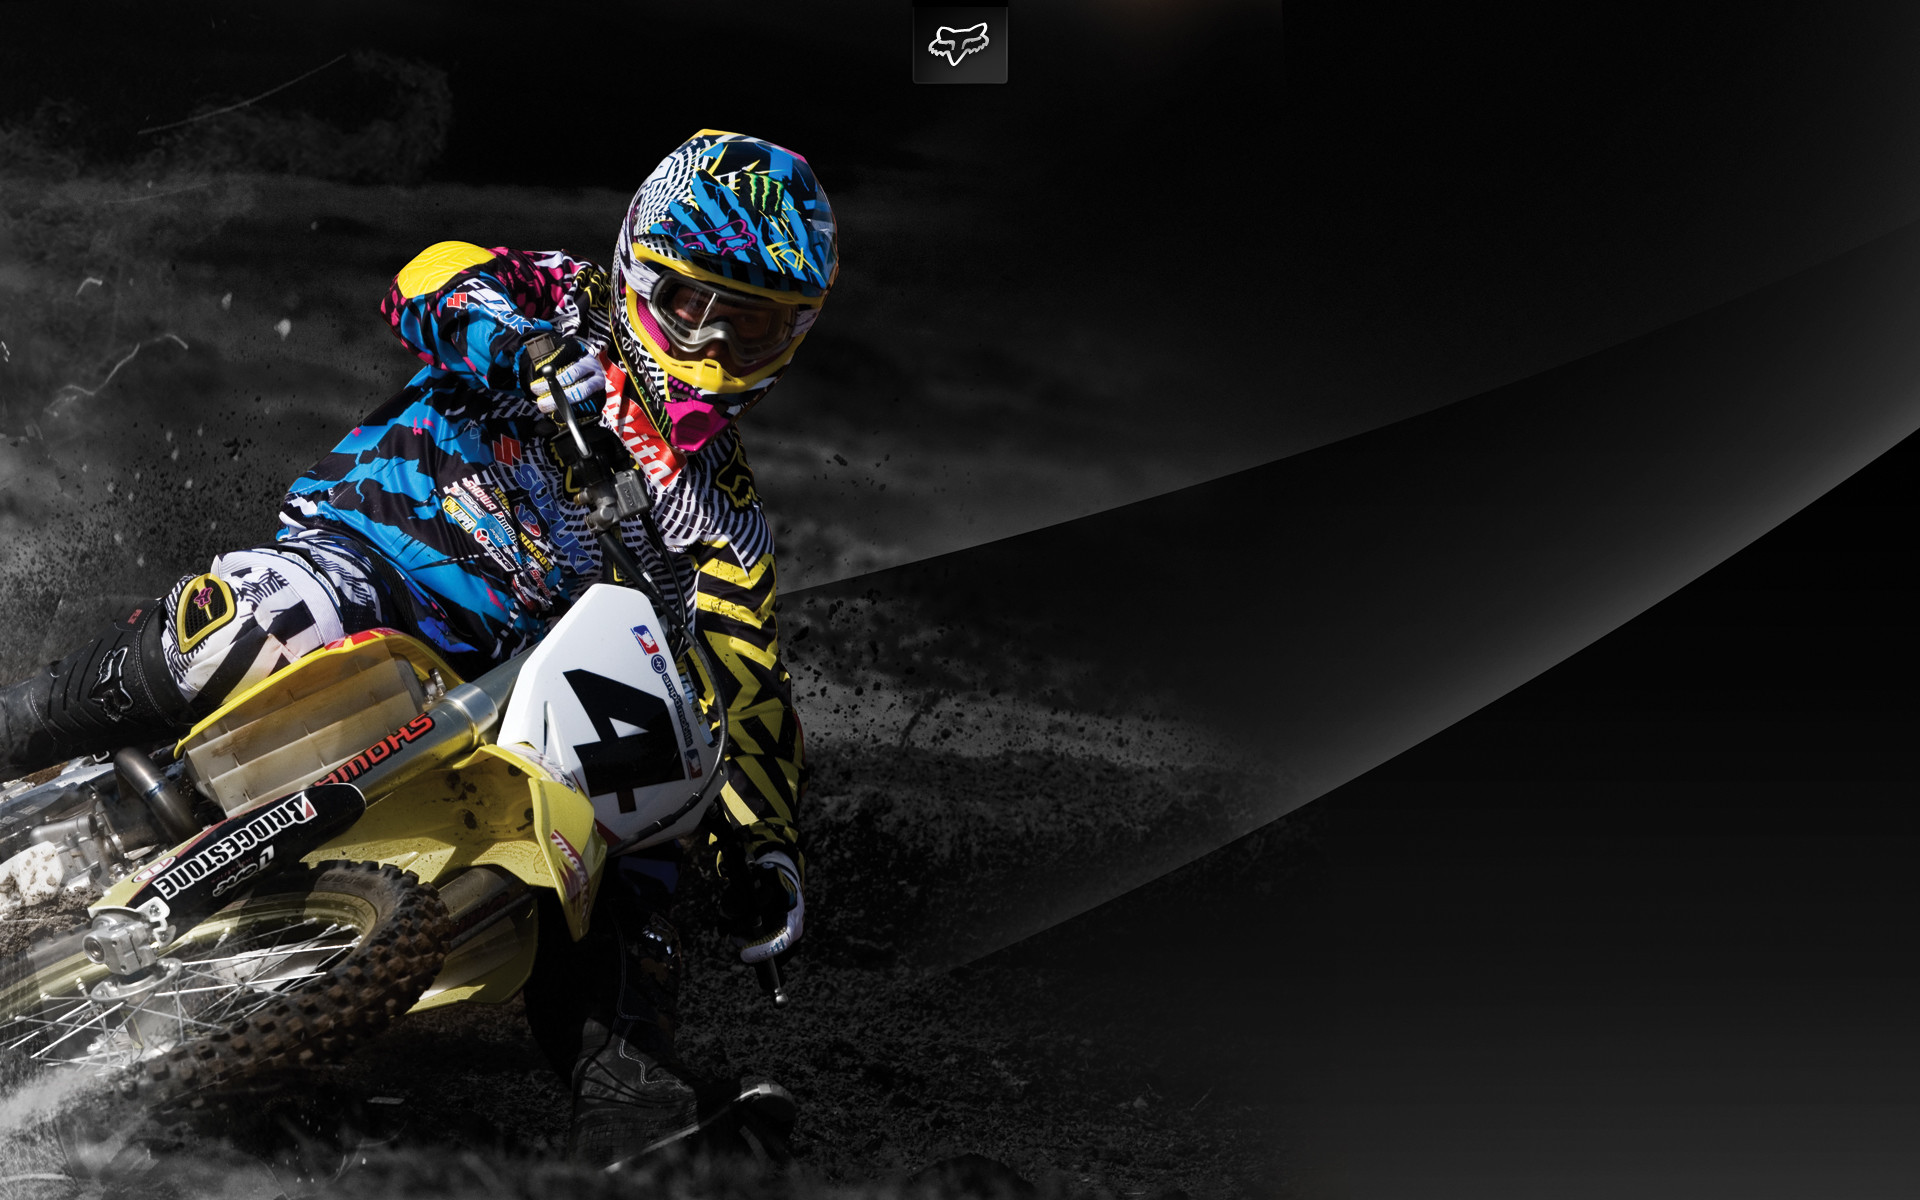 Wallpaper Motocross Bergerak